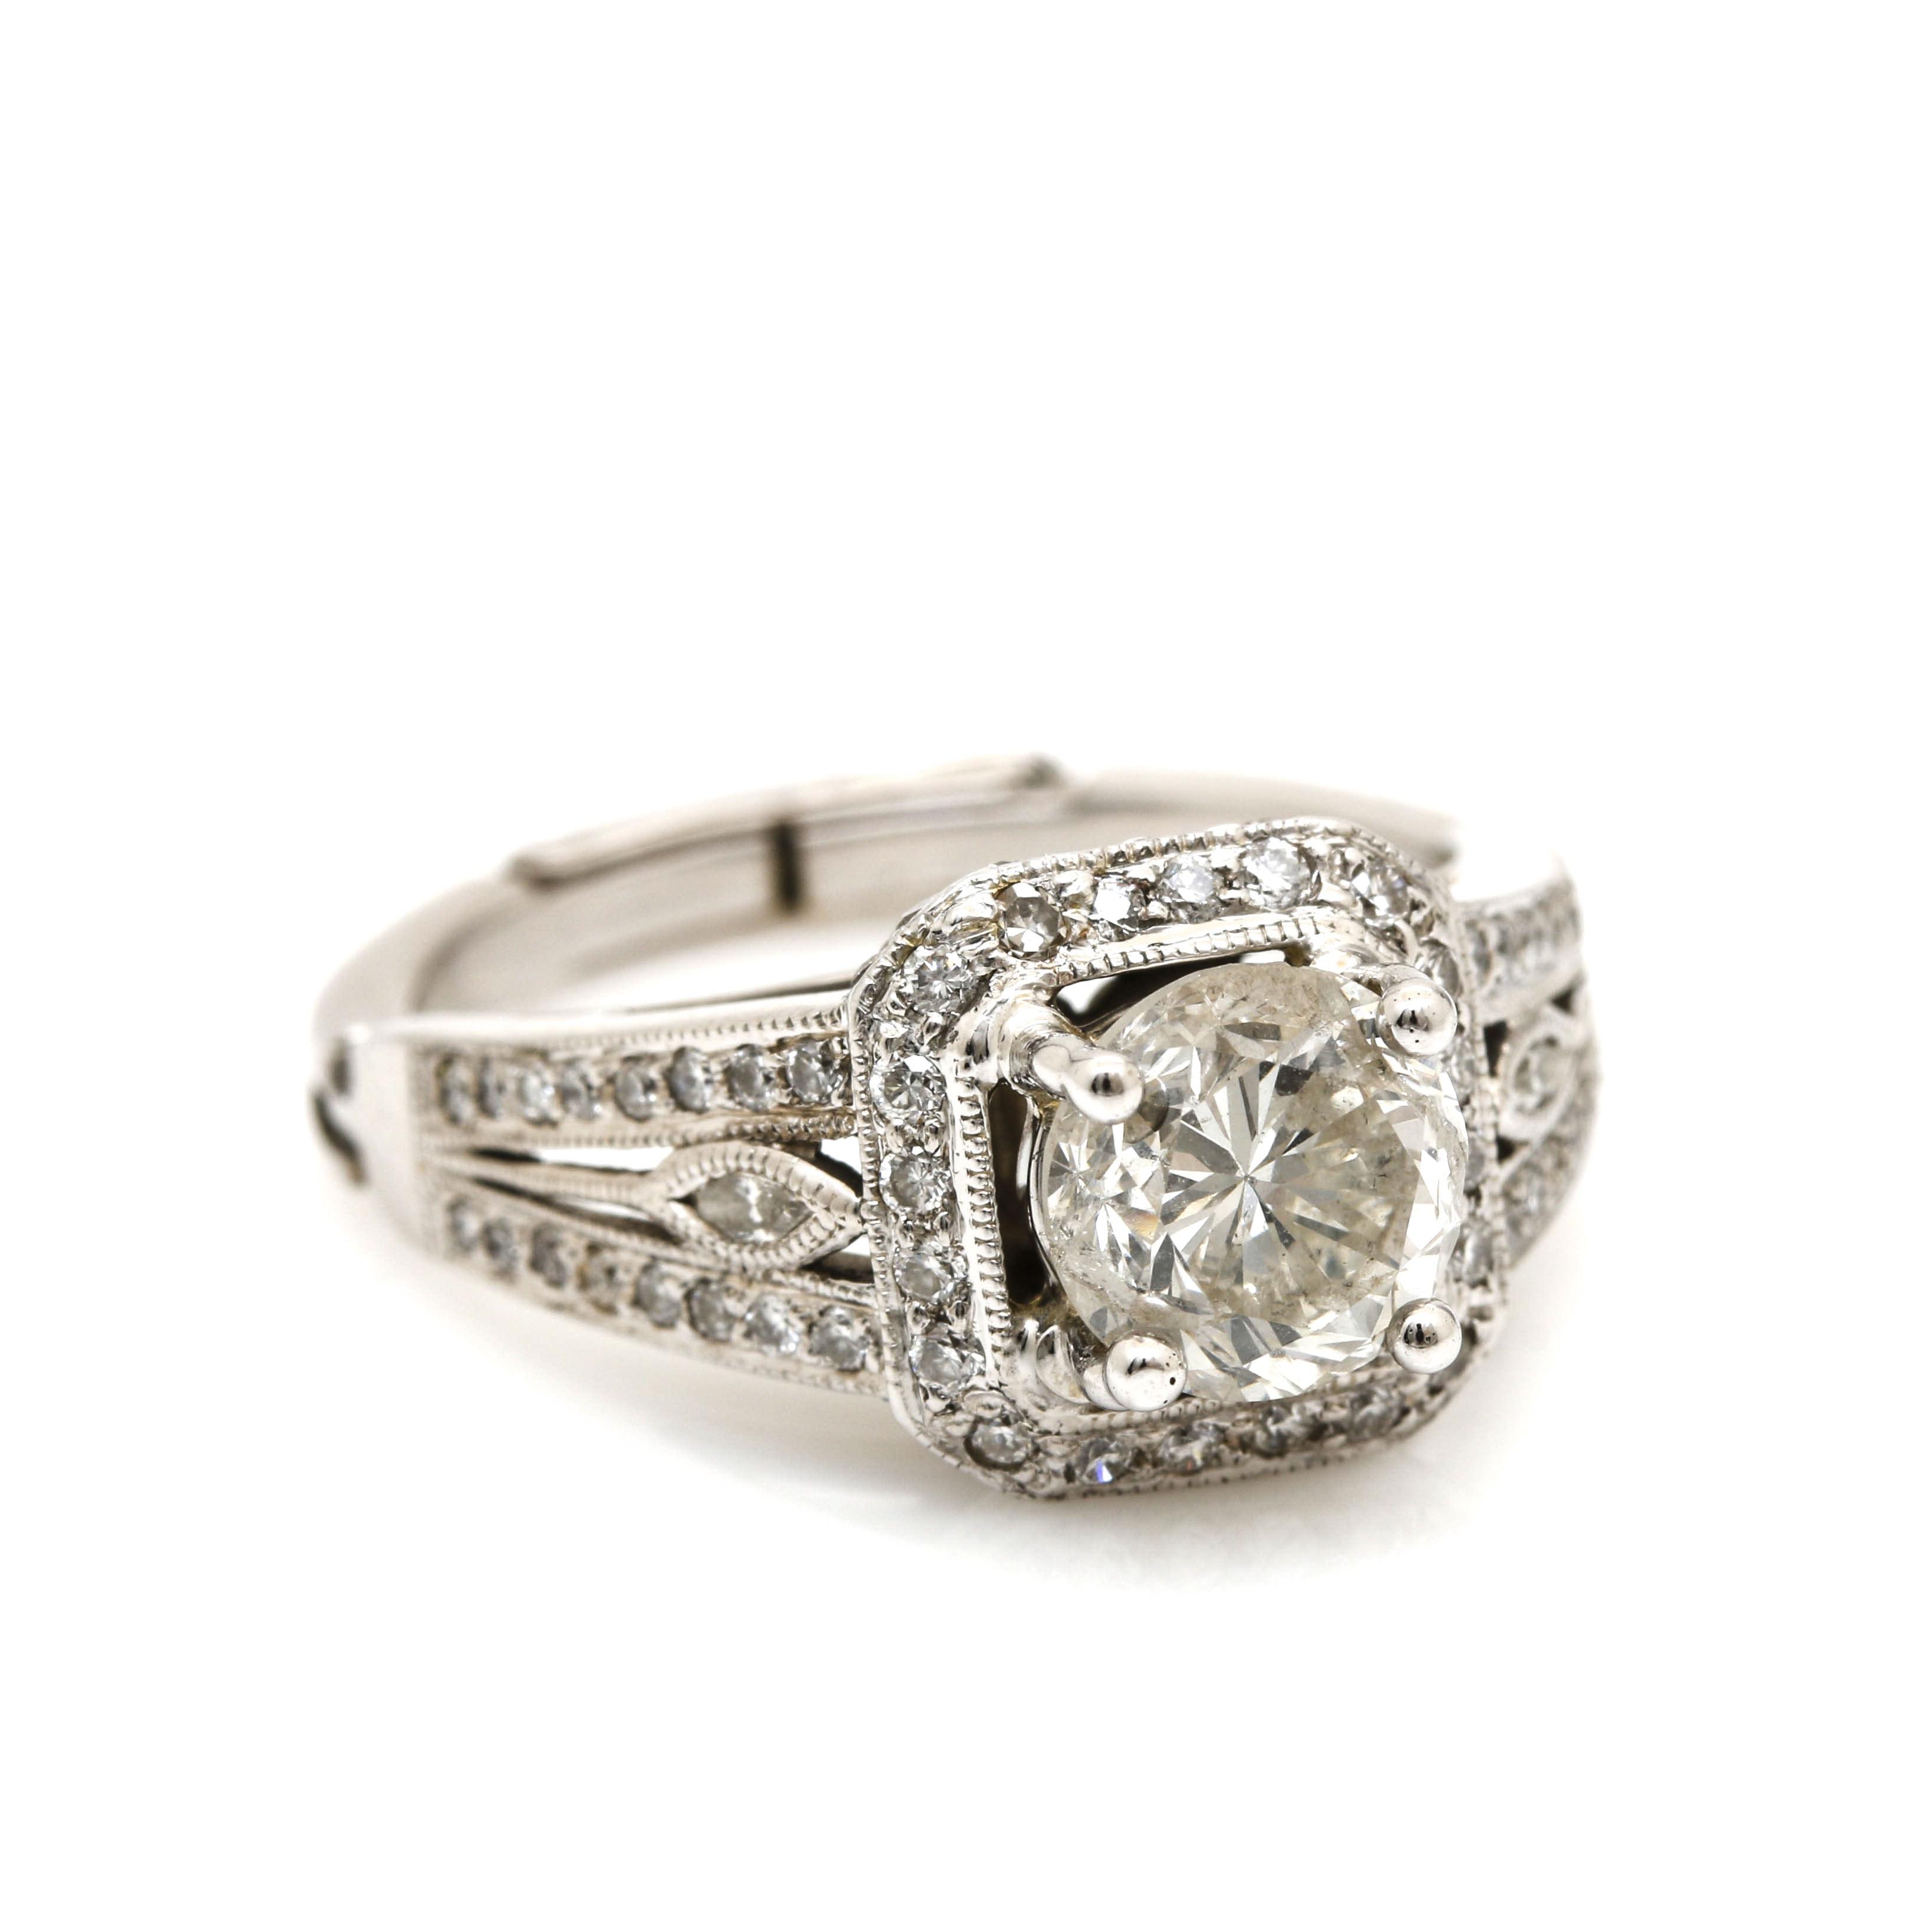 14K White Gold 1.85 CTW Diamond Arthritic Ring